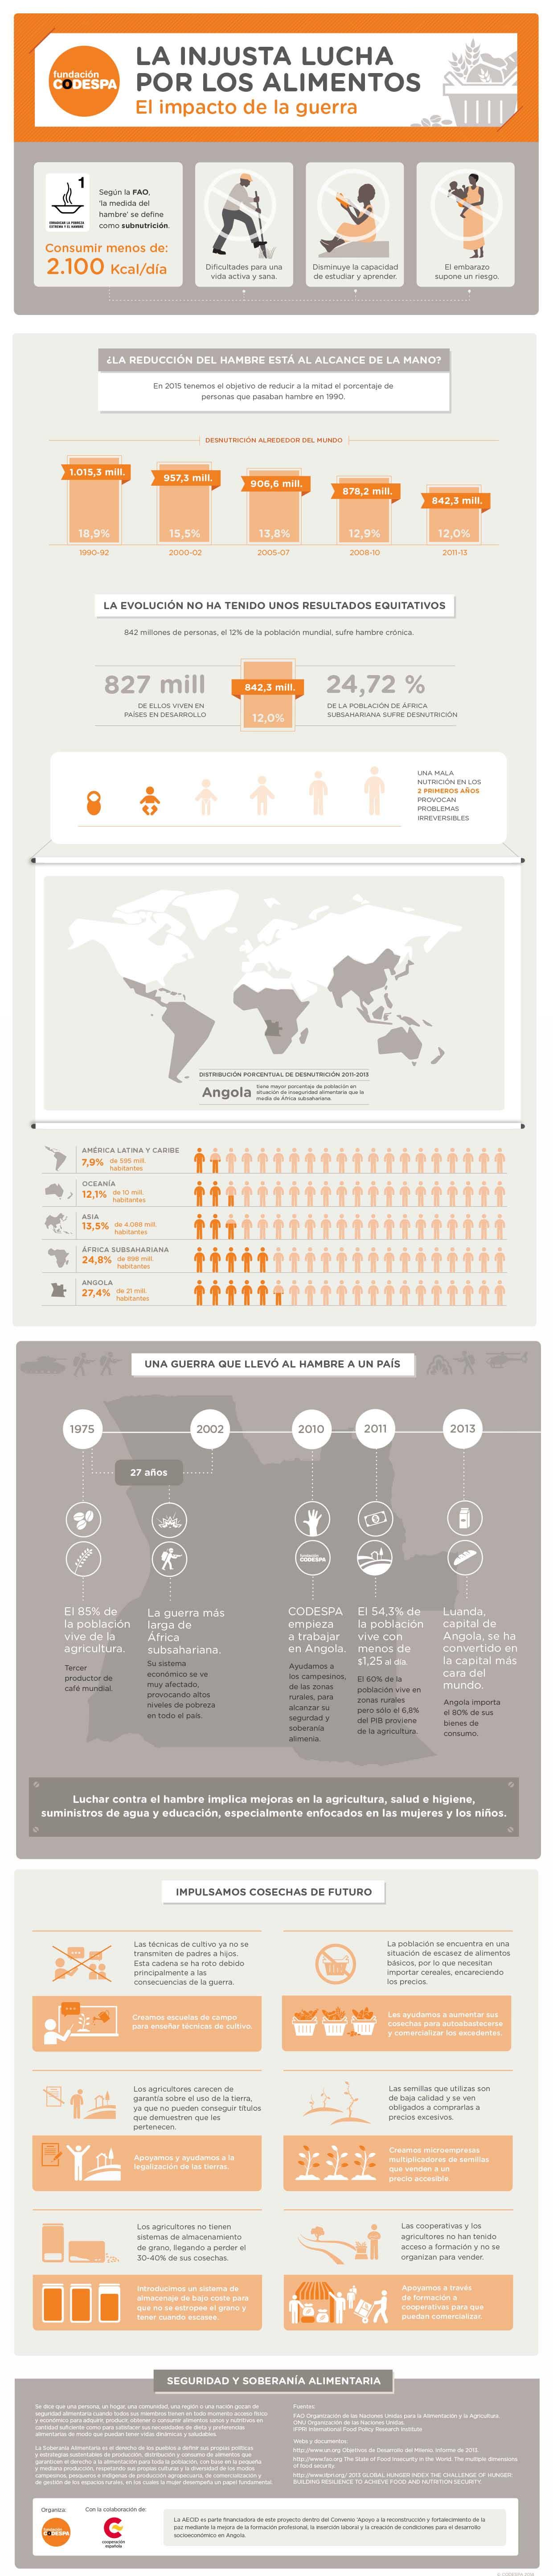 codespa-infografia-lucha-alimentos_2.jpg